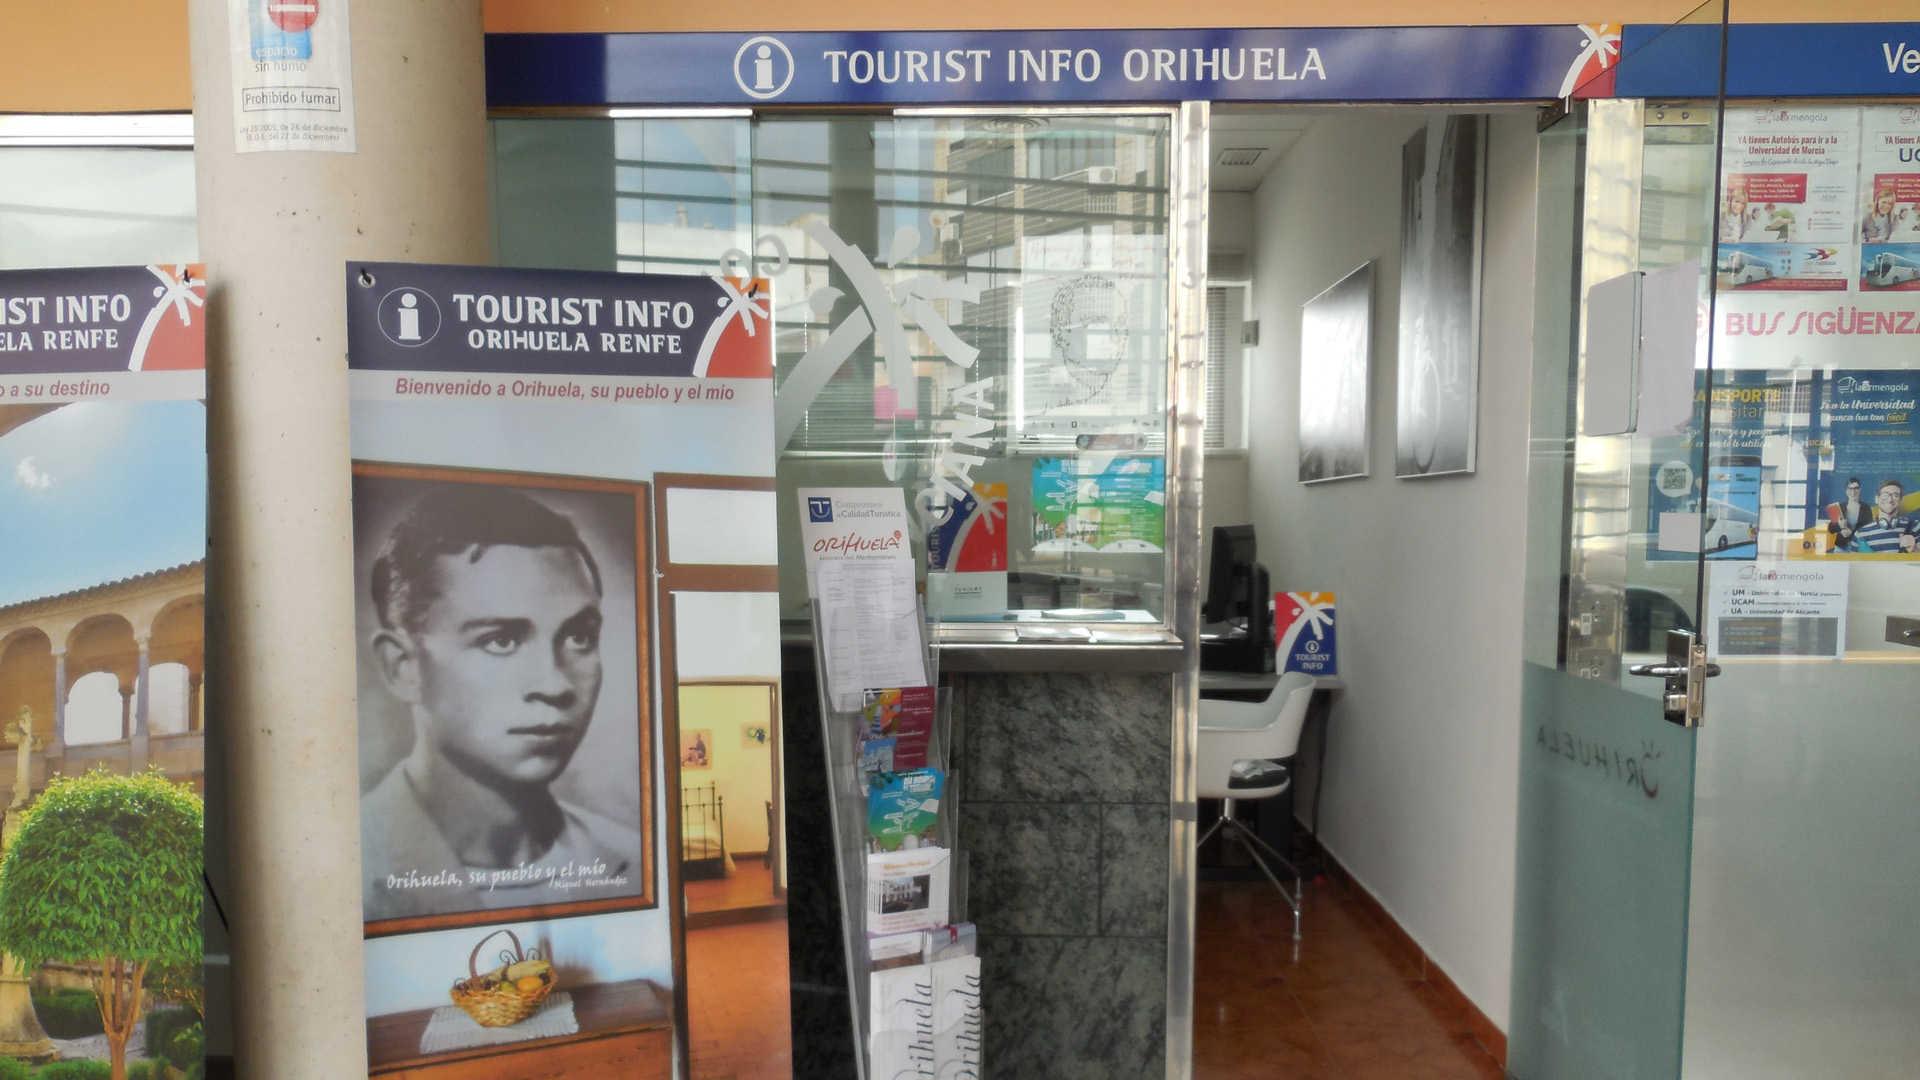 TOURIST INFO ORIHUELA - RENFE